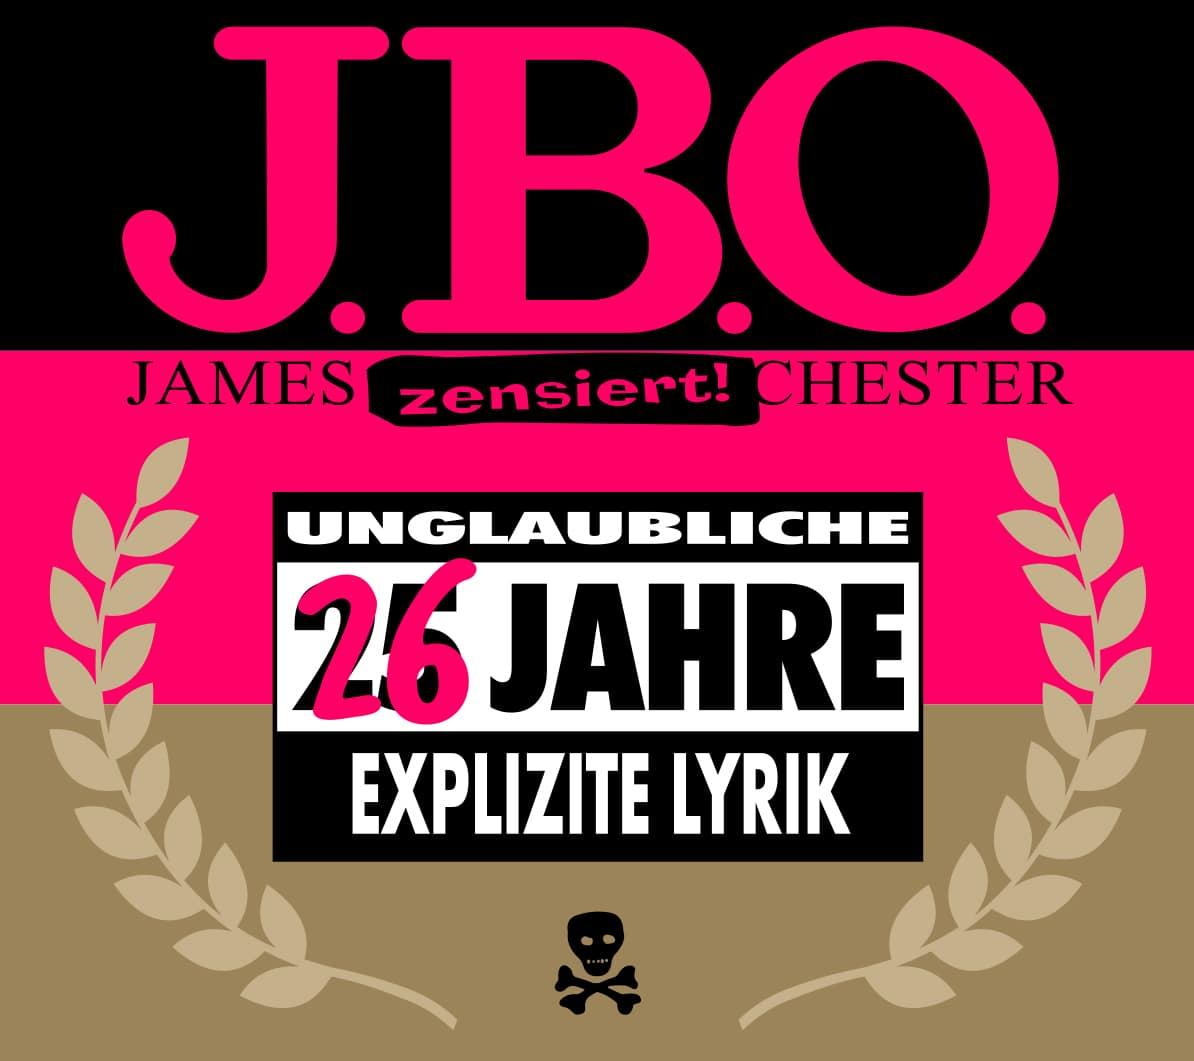 26 Jahre Explizite Lyrik: Samstag, 20. November 2021 - Club Vaudeville, Lindau